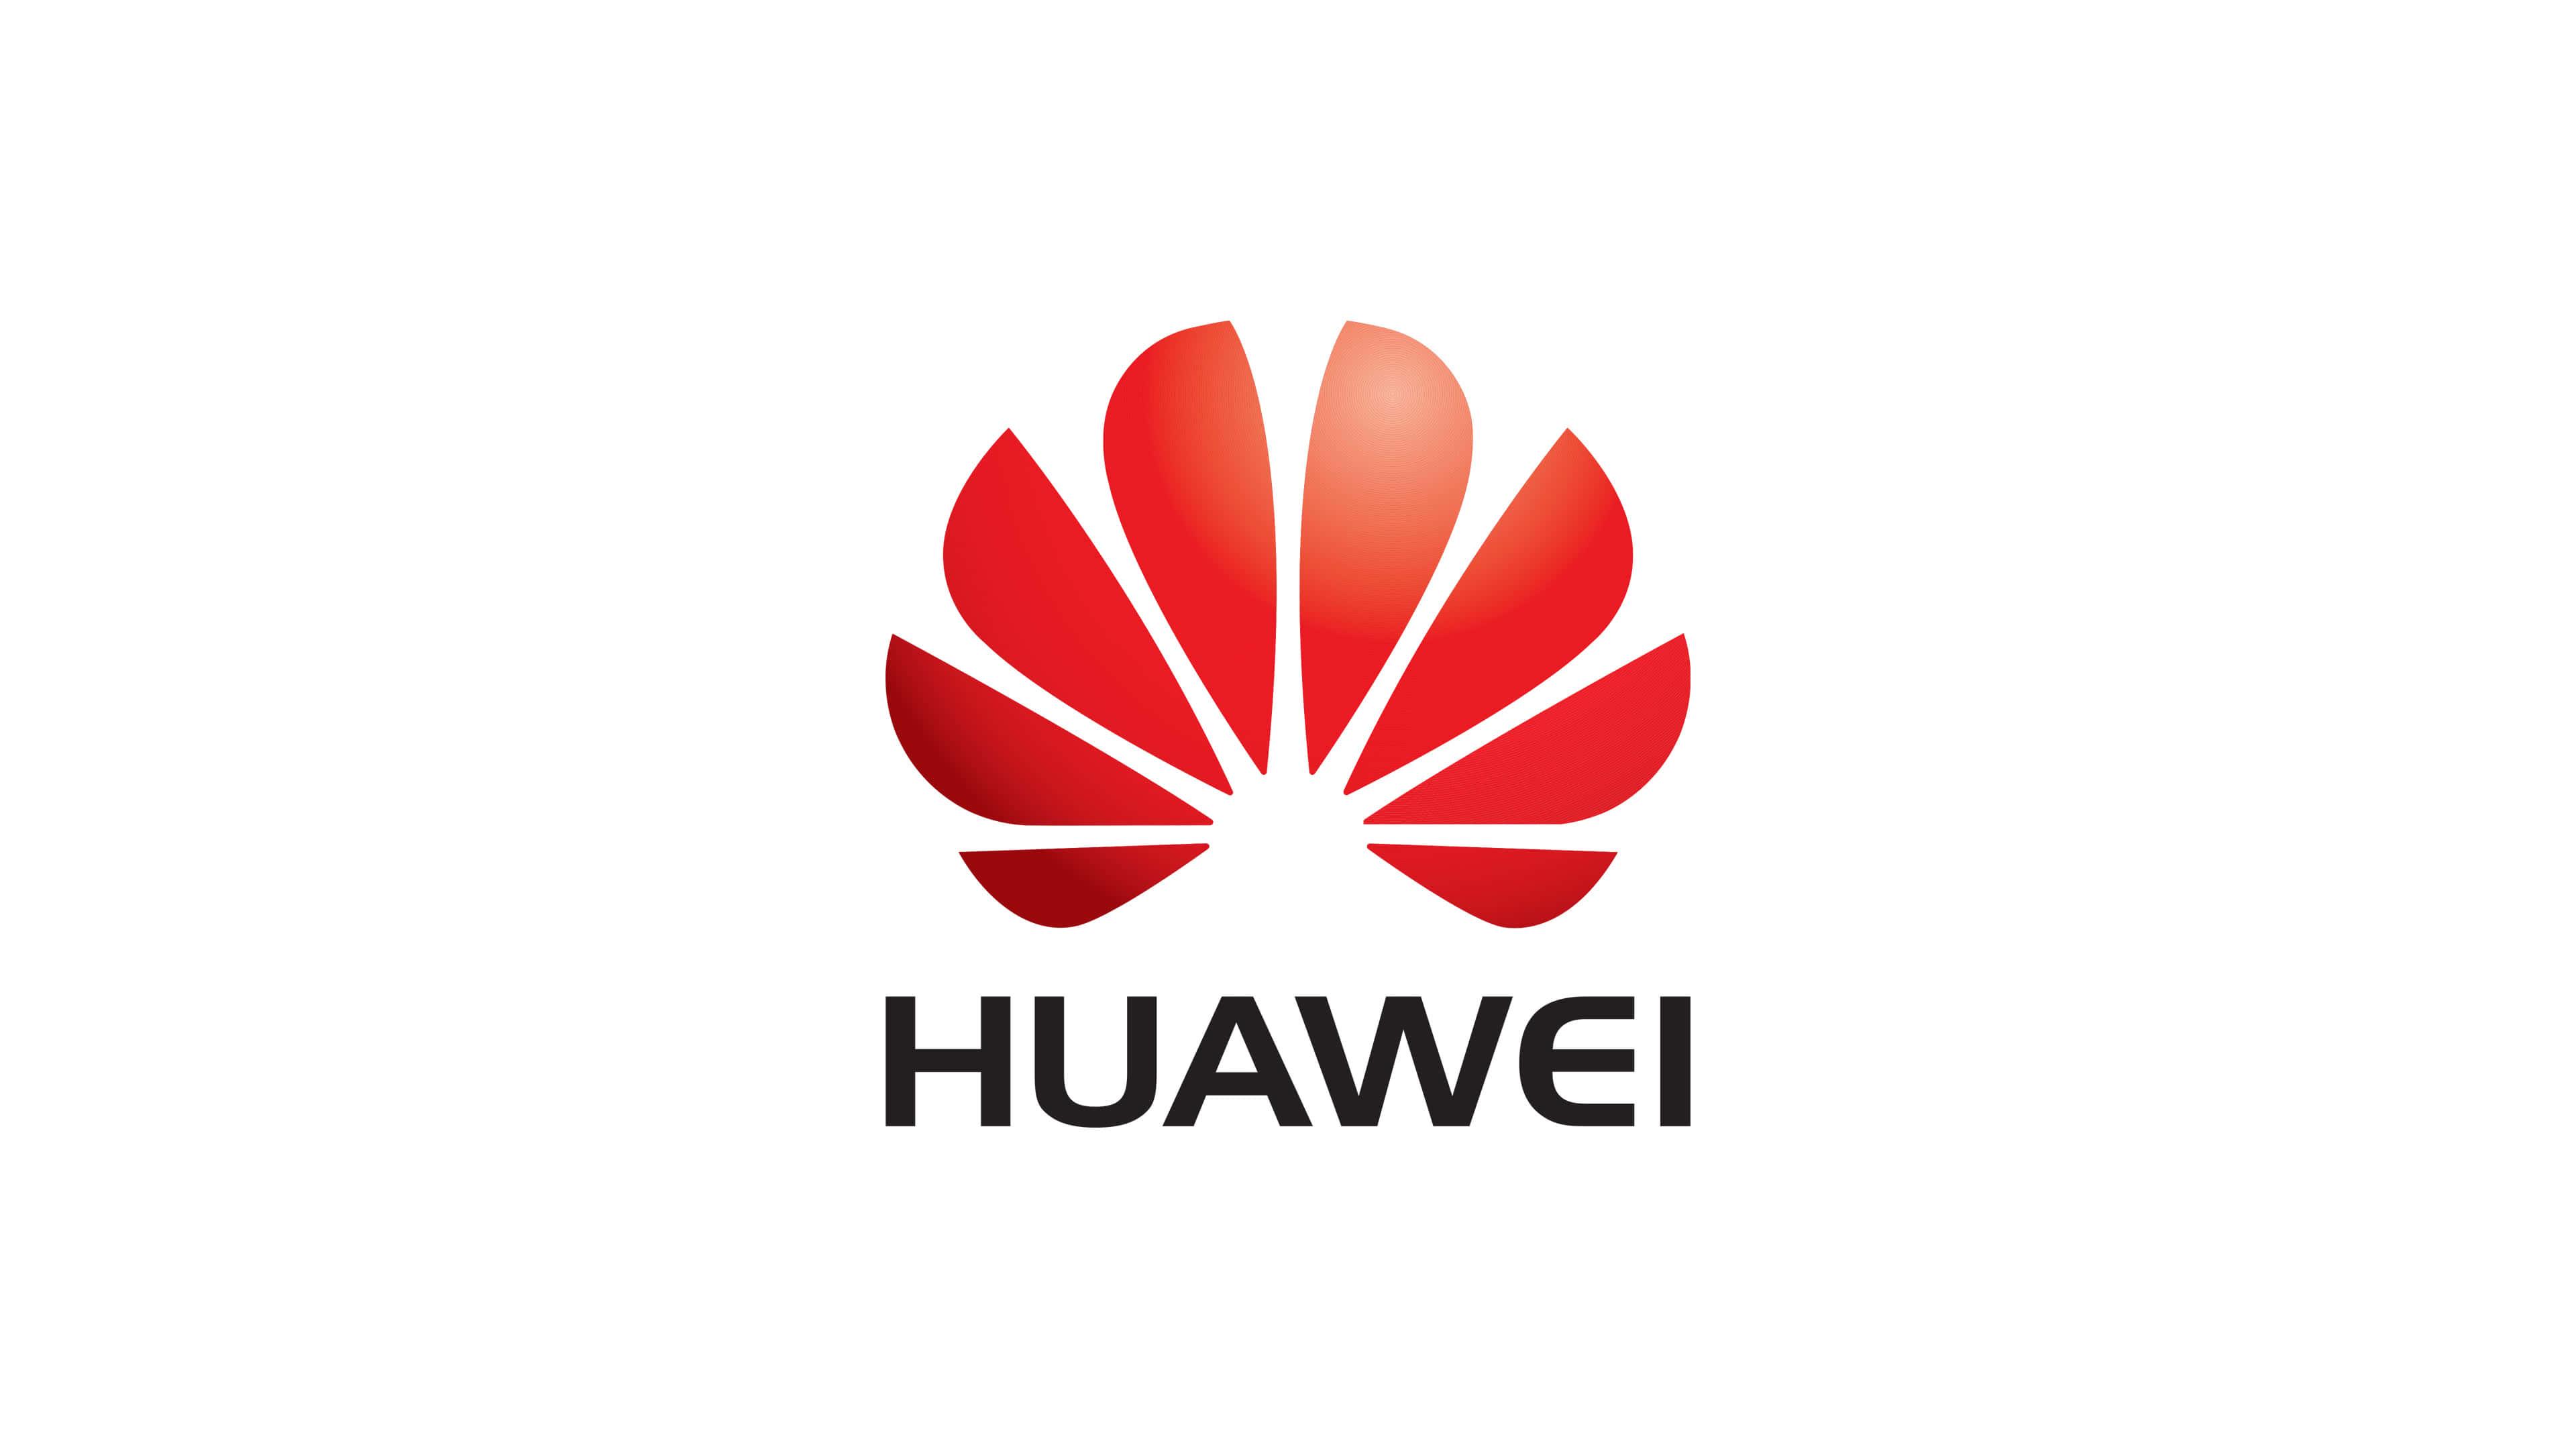 huawei logo uhd 4k wallpaper